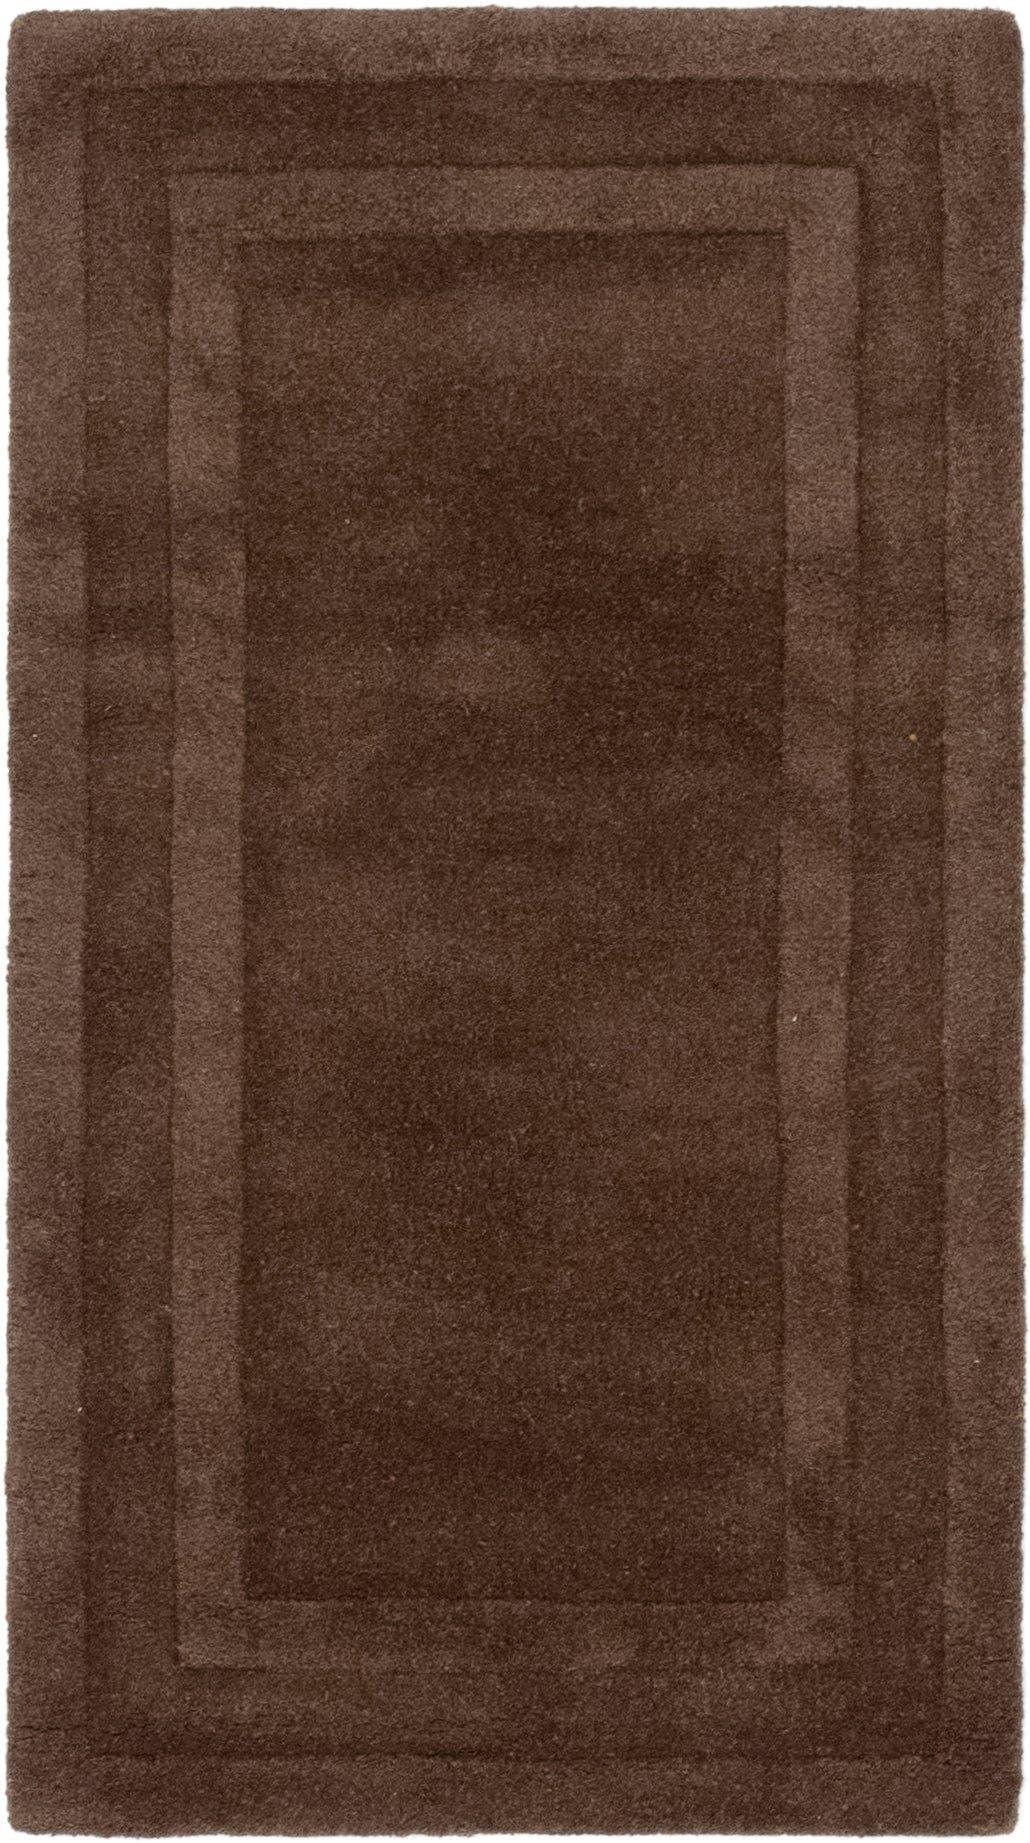 2' 8 x 4' 10 Luna Rug main image